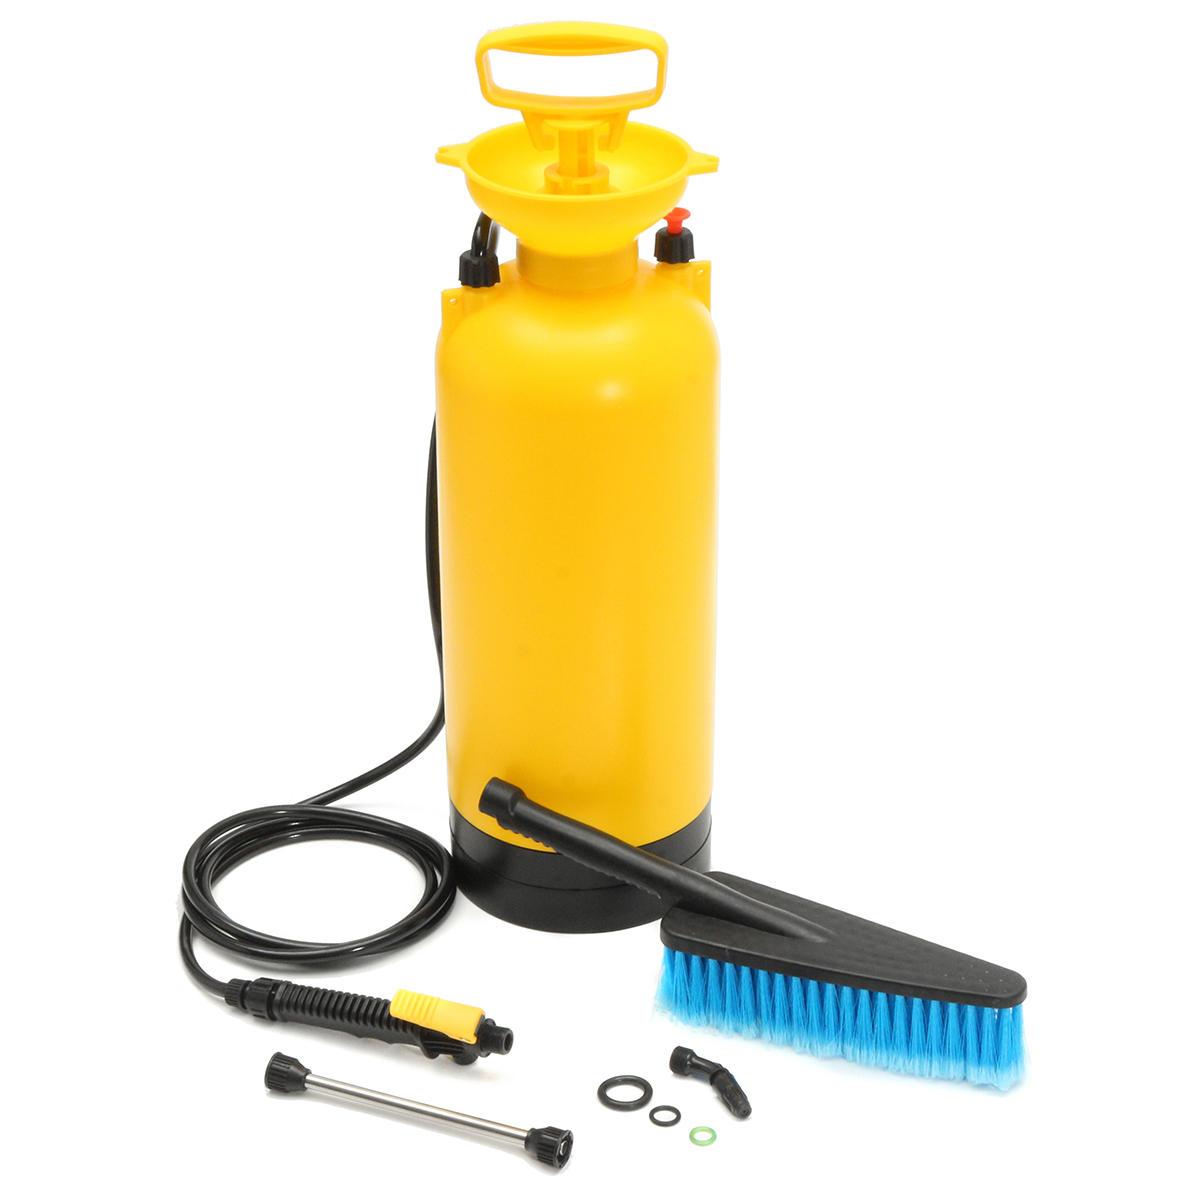 [US34.99] 8L Portable Pressure Washer Power Pump Spray